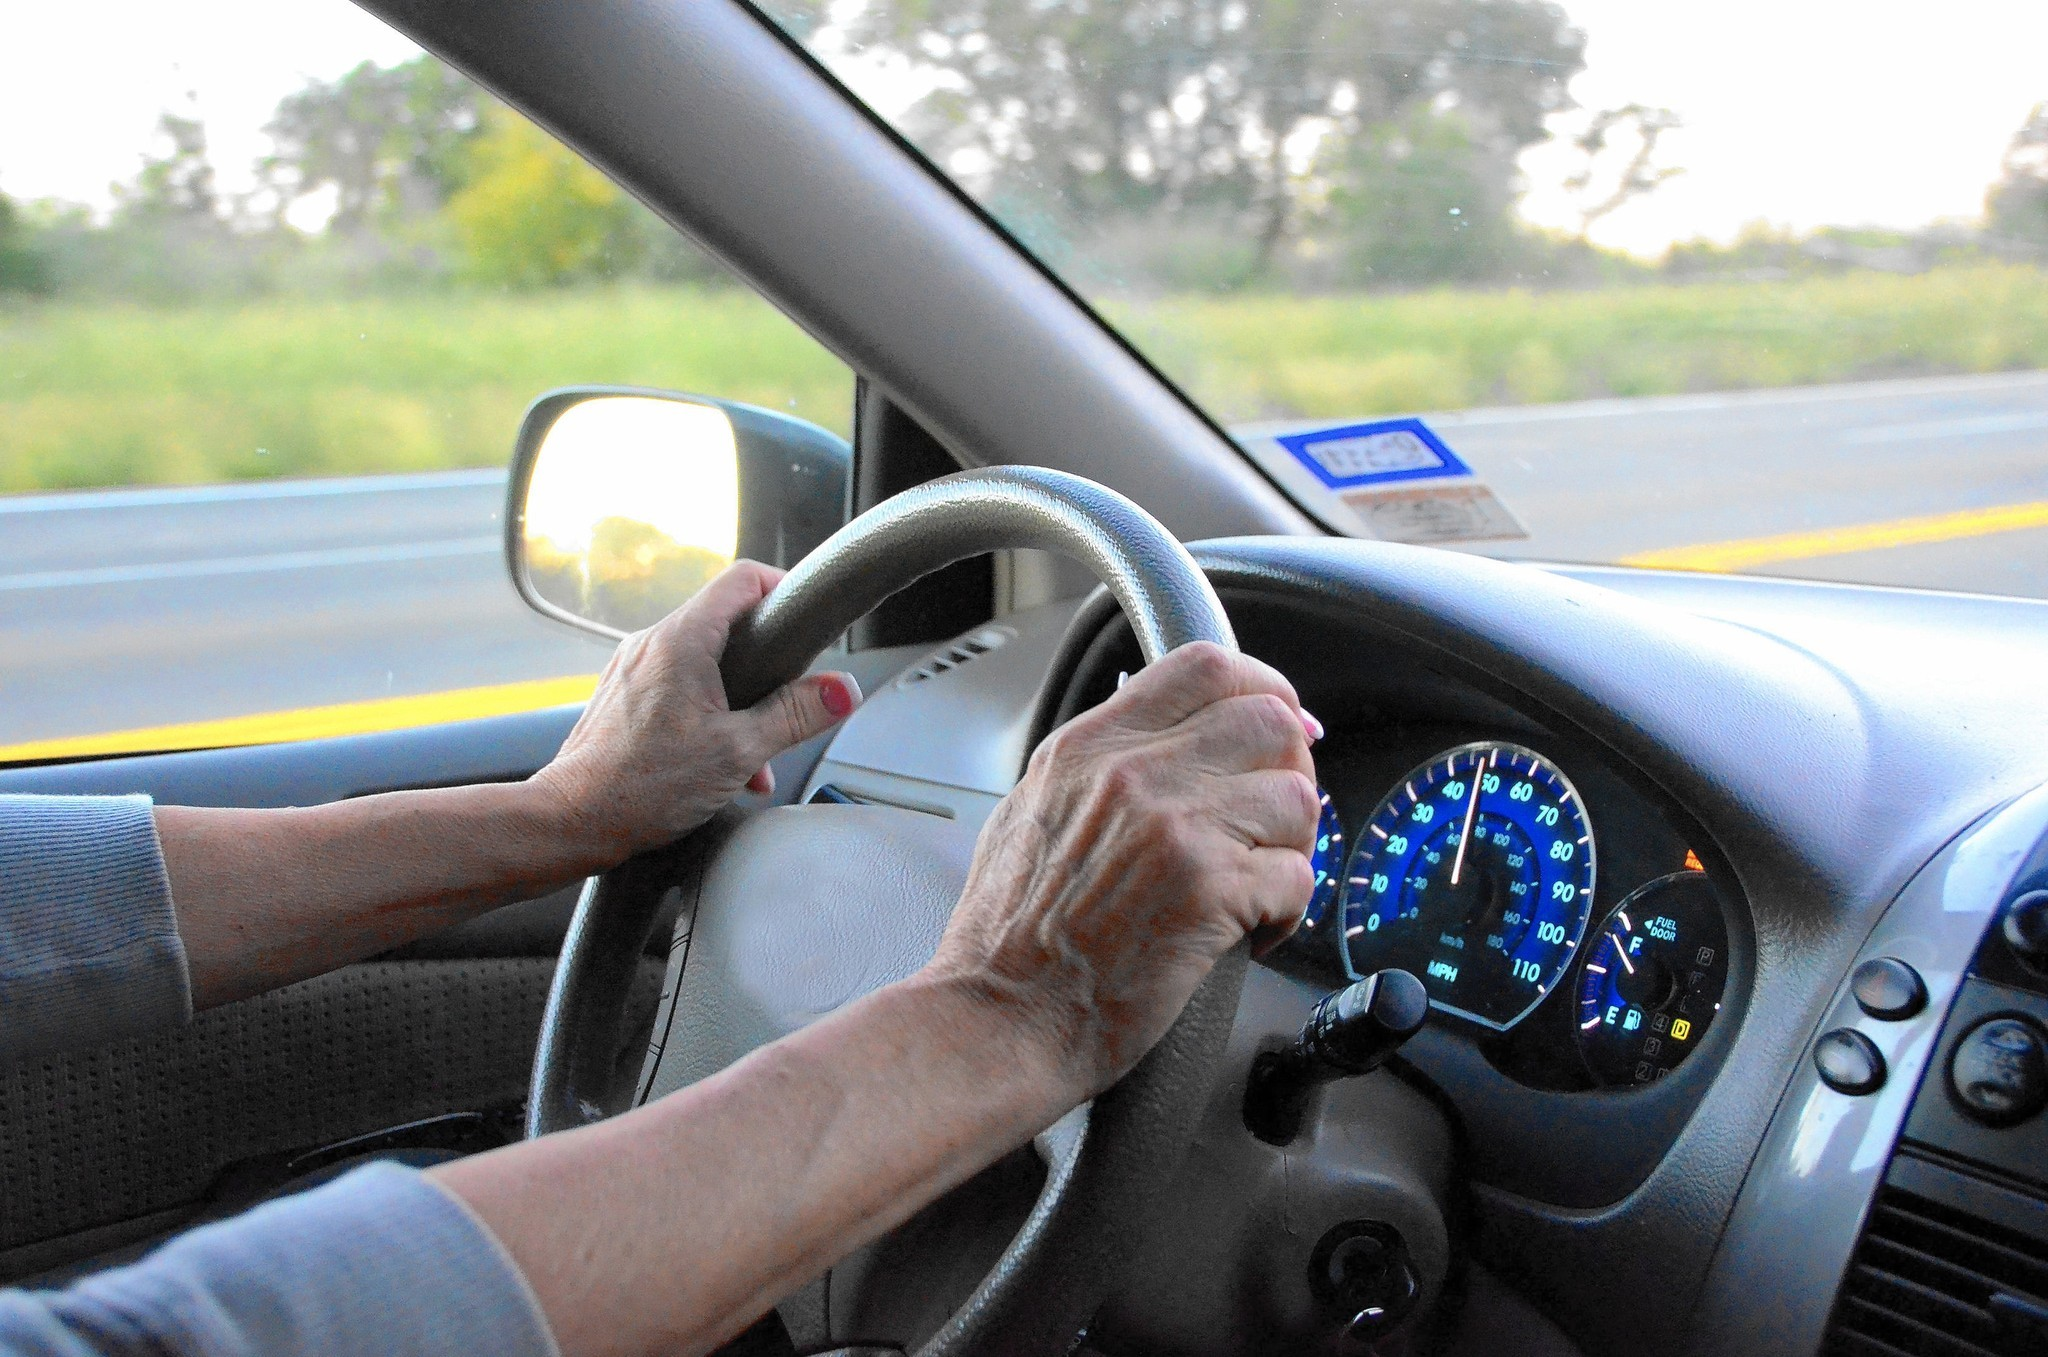 Senior drivers confront proliferation of new car technology